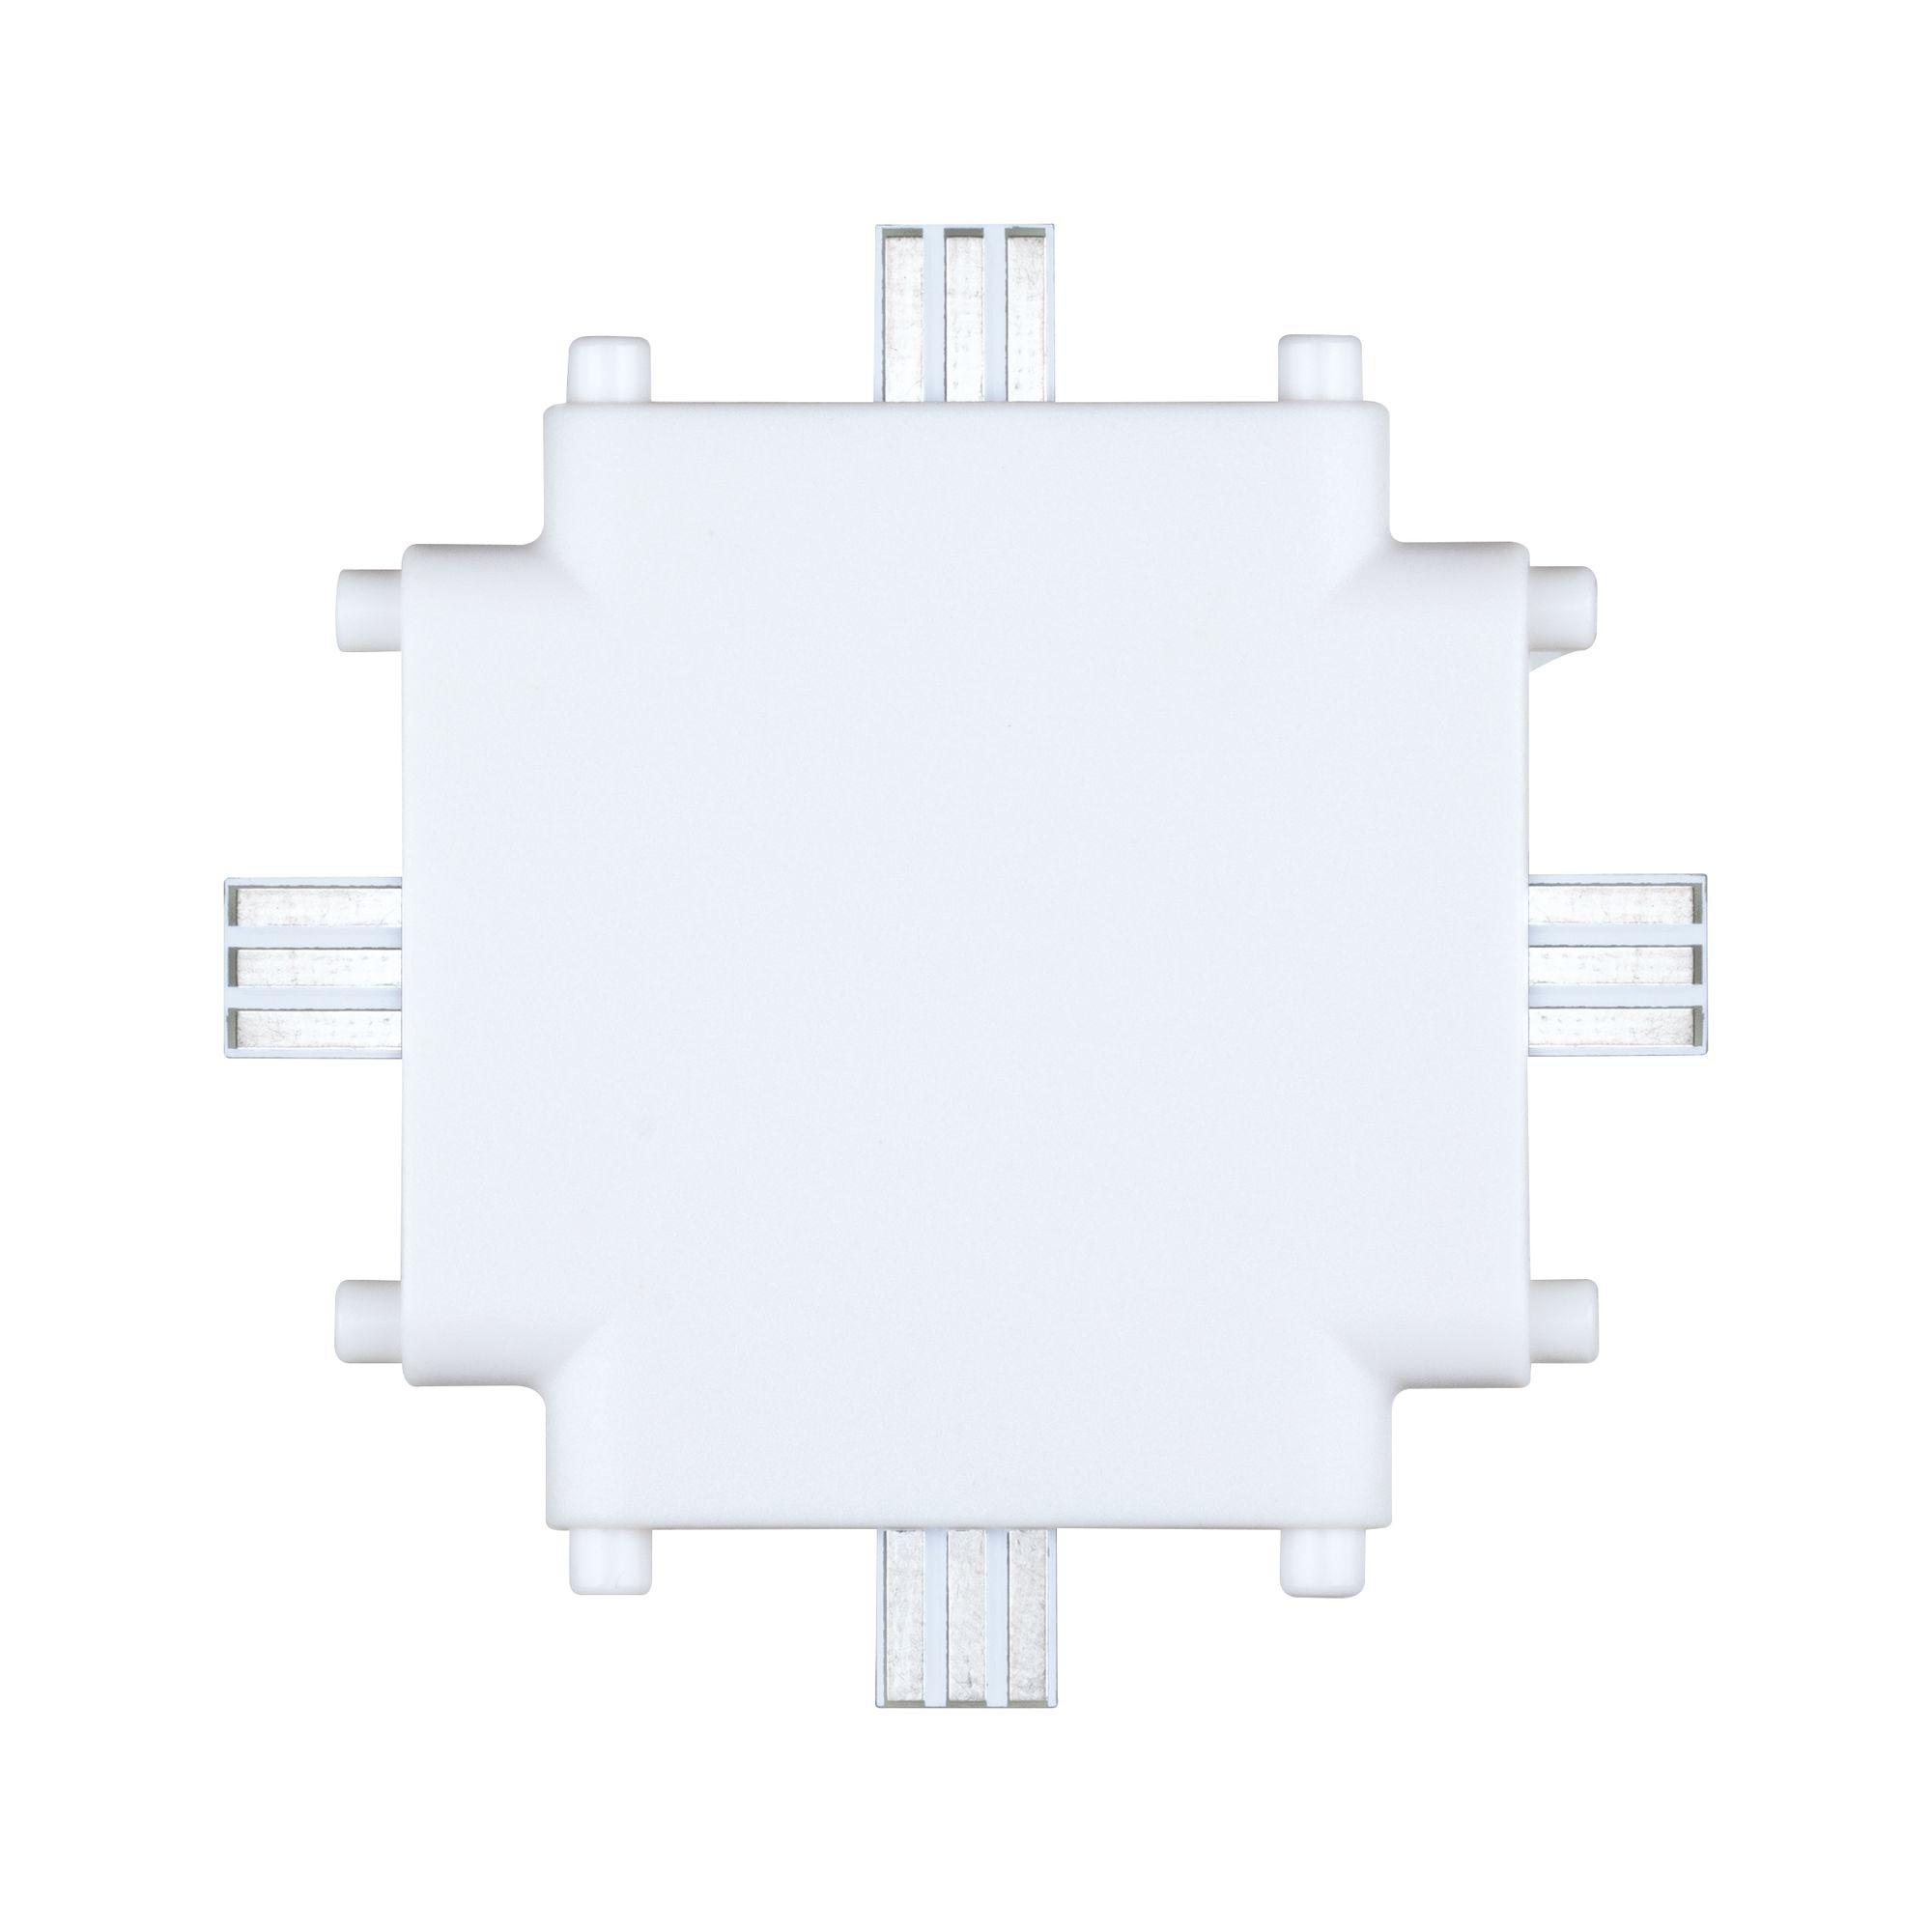 Paulmann Möbelleuchten Clever Connect X-Verbinder Border Weiß matt 12V